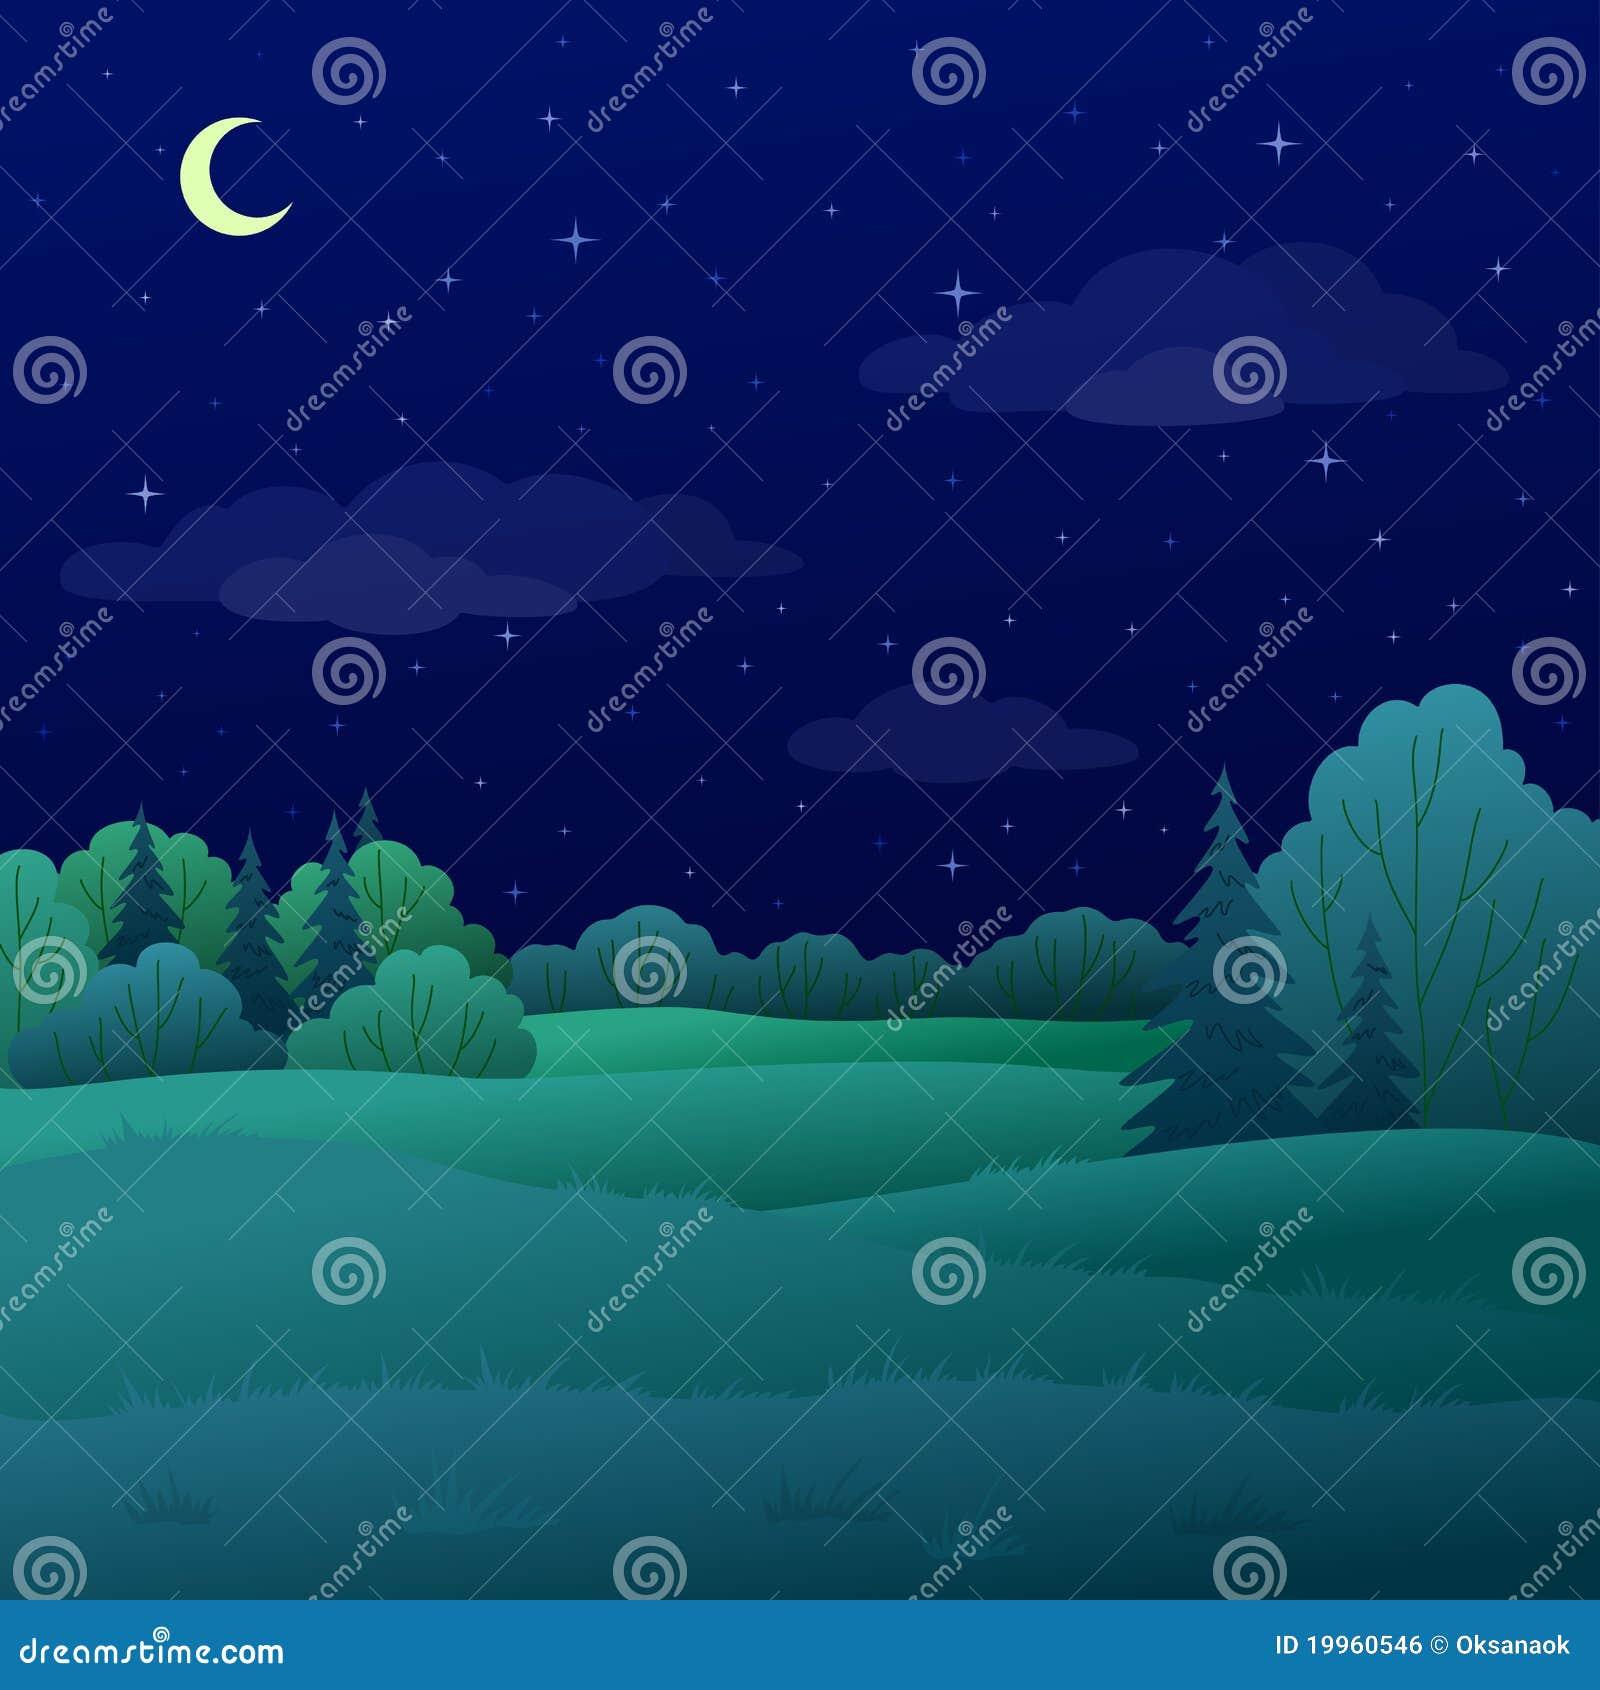 Paisaje, bosque del verano de la noche